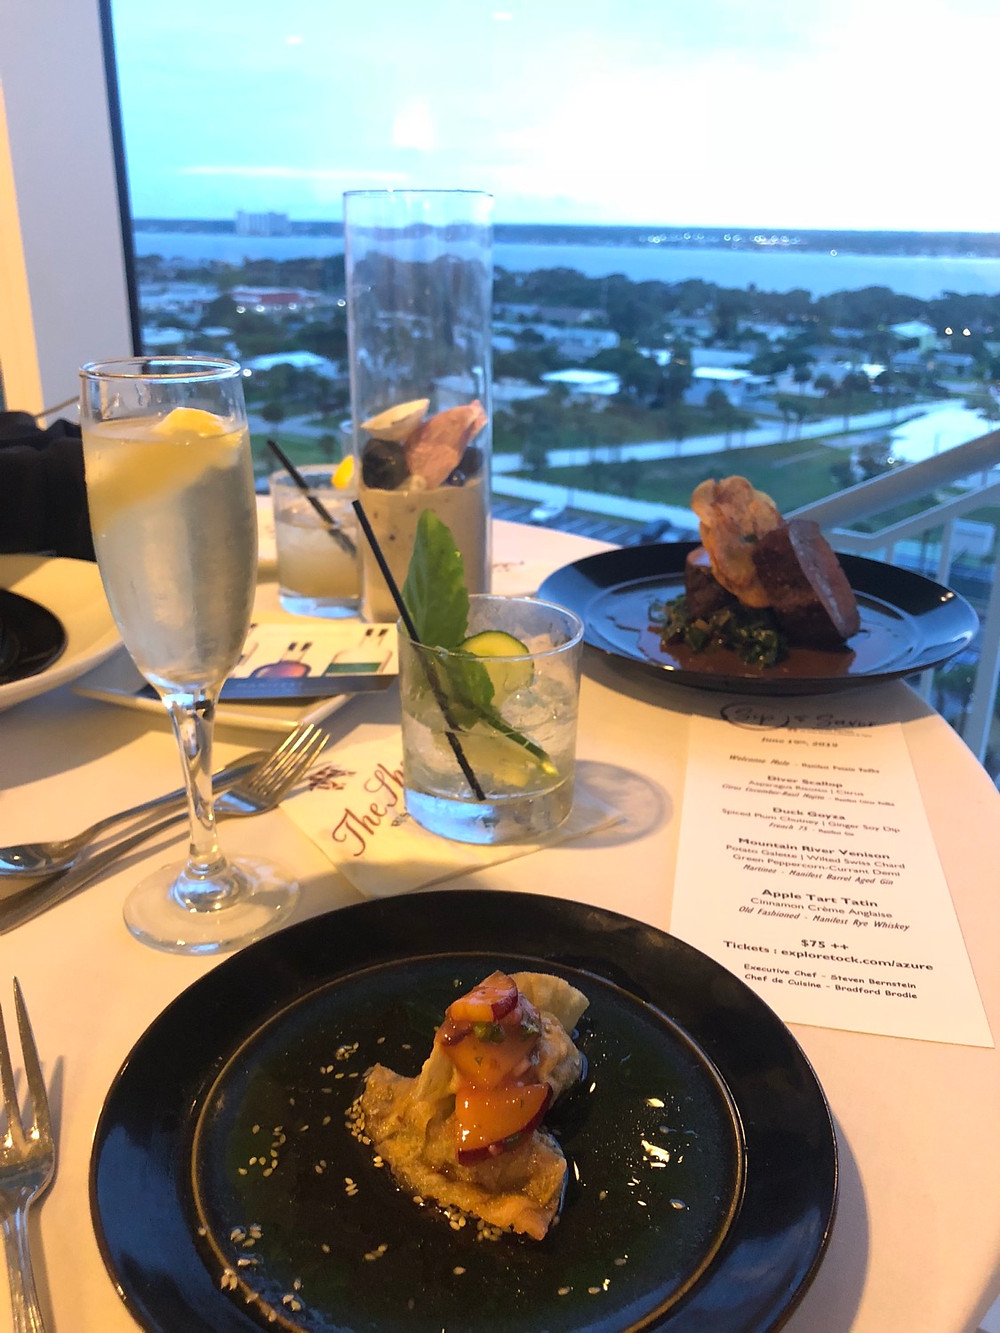 Florida-Travel-Blog-Sip-and-Savor-Dinner-The-Shores-Resort-and-Spa-Daytona-Beach